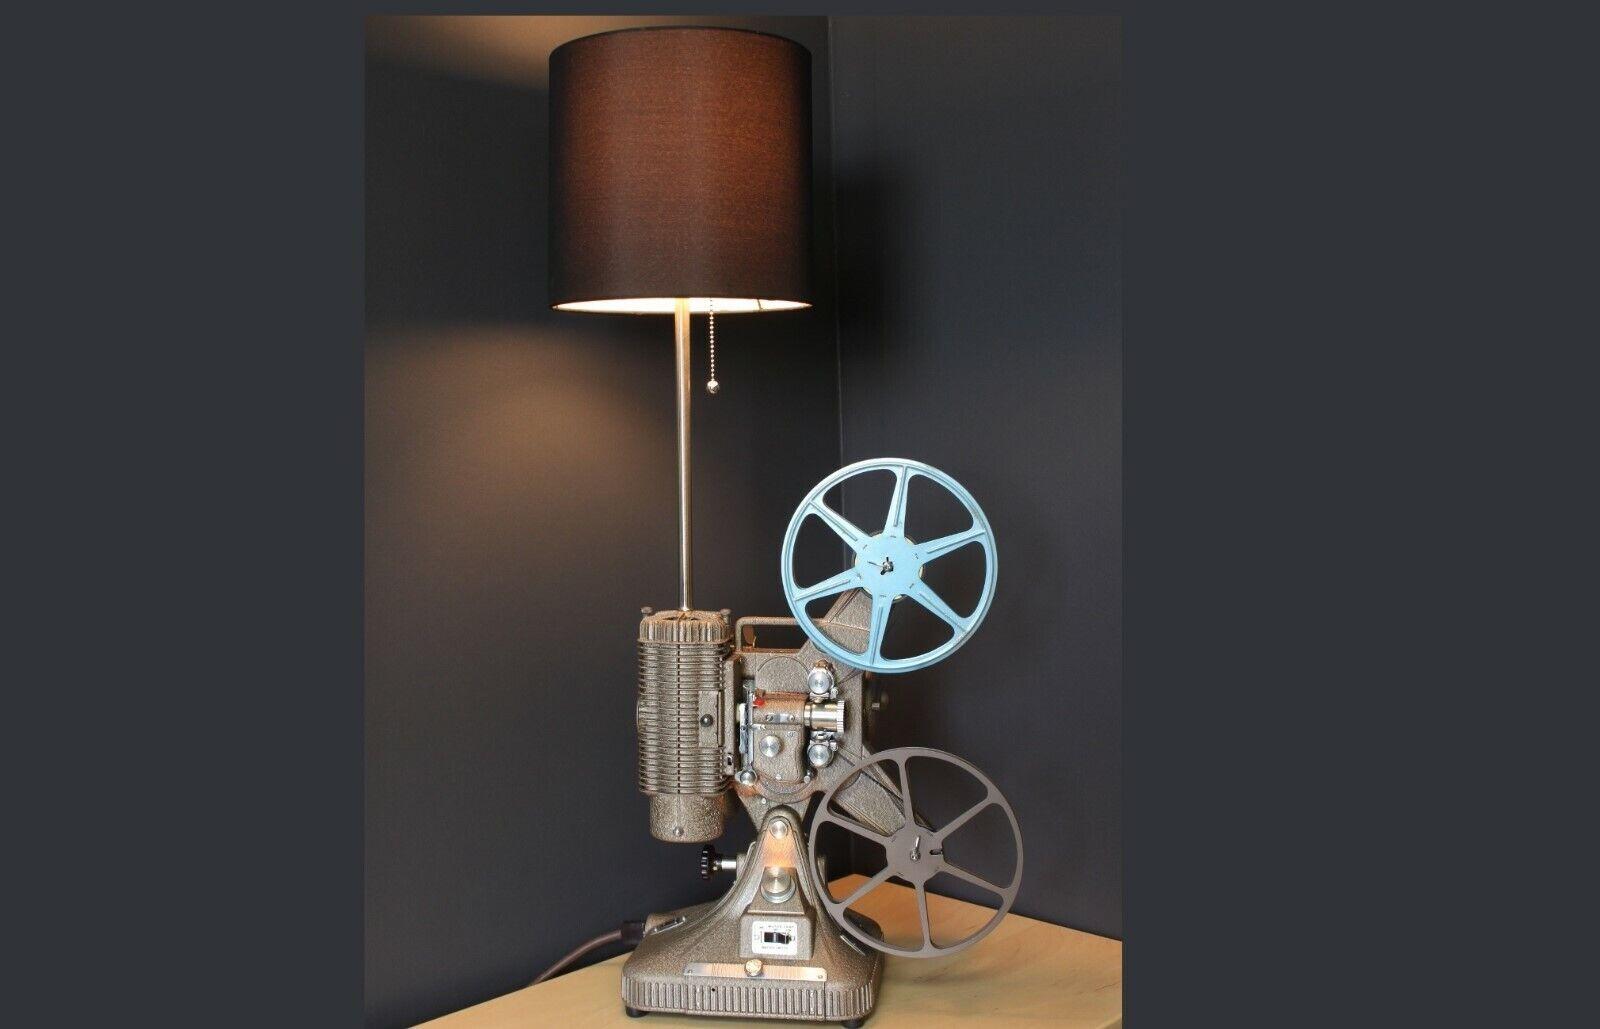 Vintage Table Lamp   Desk Lamp - Keystone Regal 8MM Projector - Hollywood décor